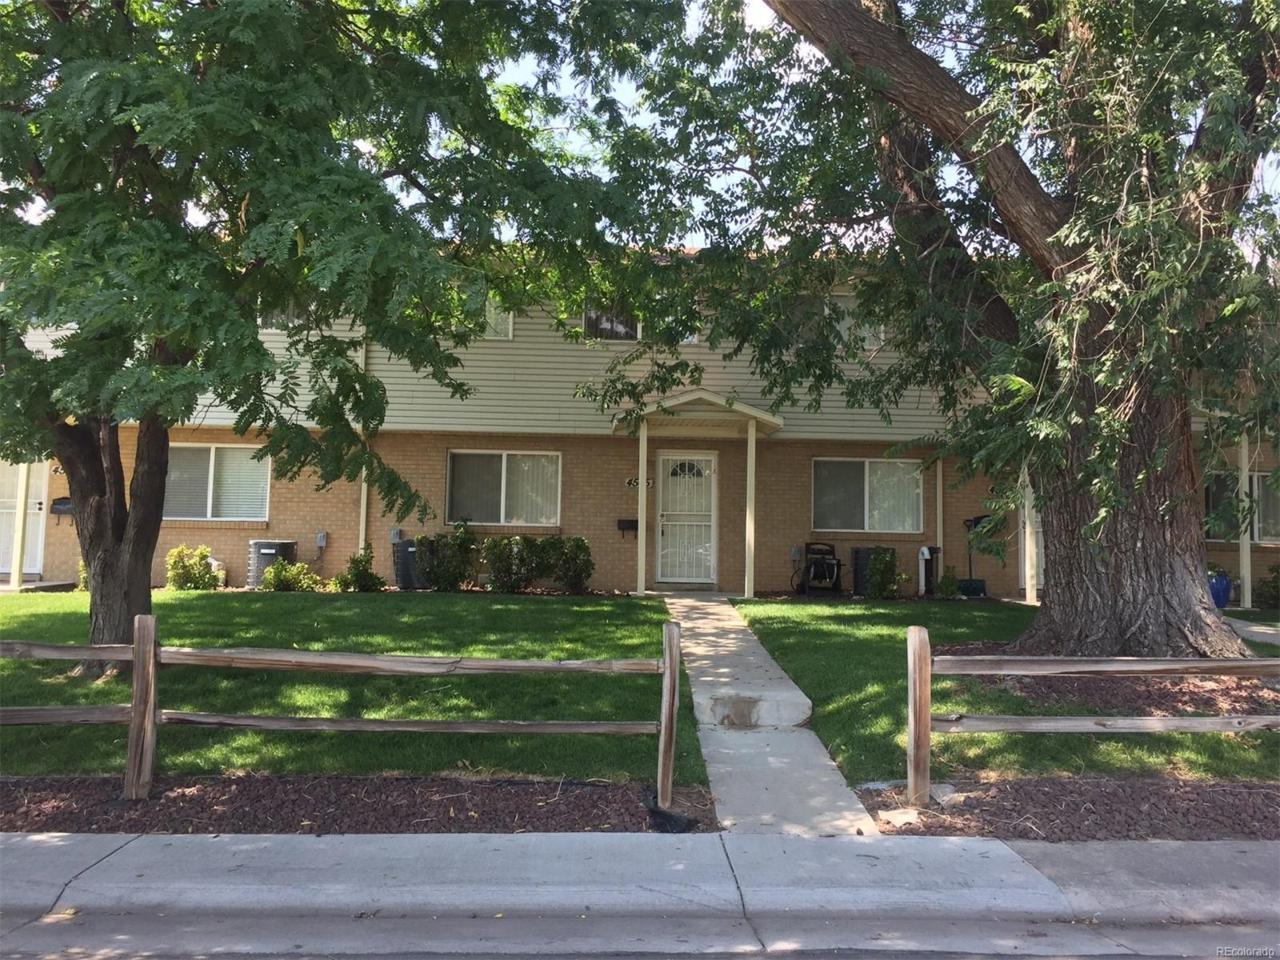 4505 Everett Street, Wheat Ridge, CO 80033 (MLS #5892876) :: 8z Real Estate